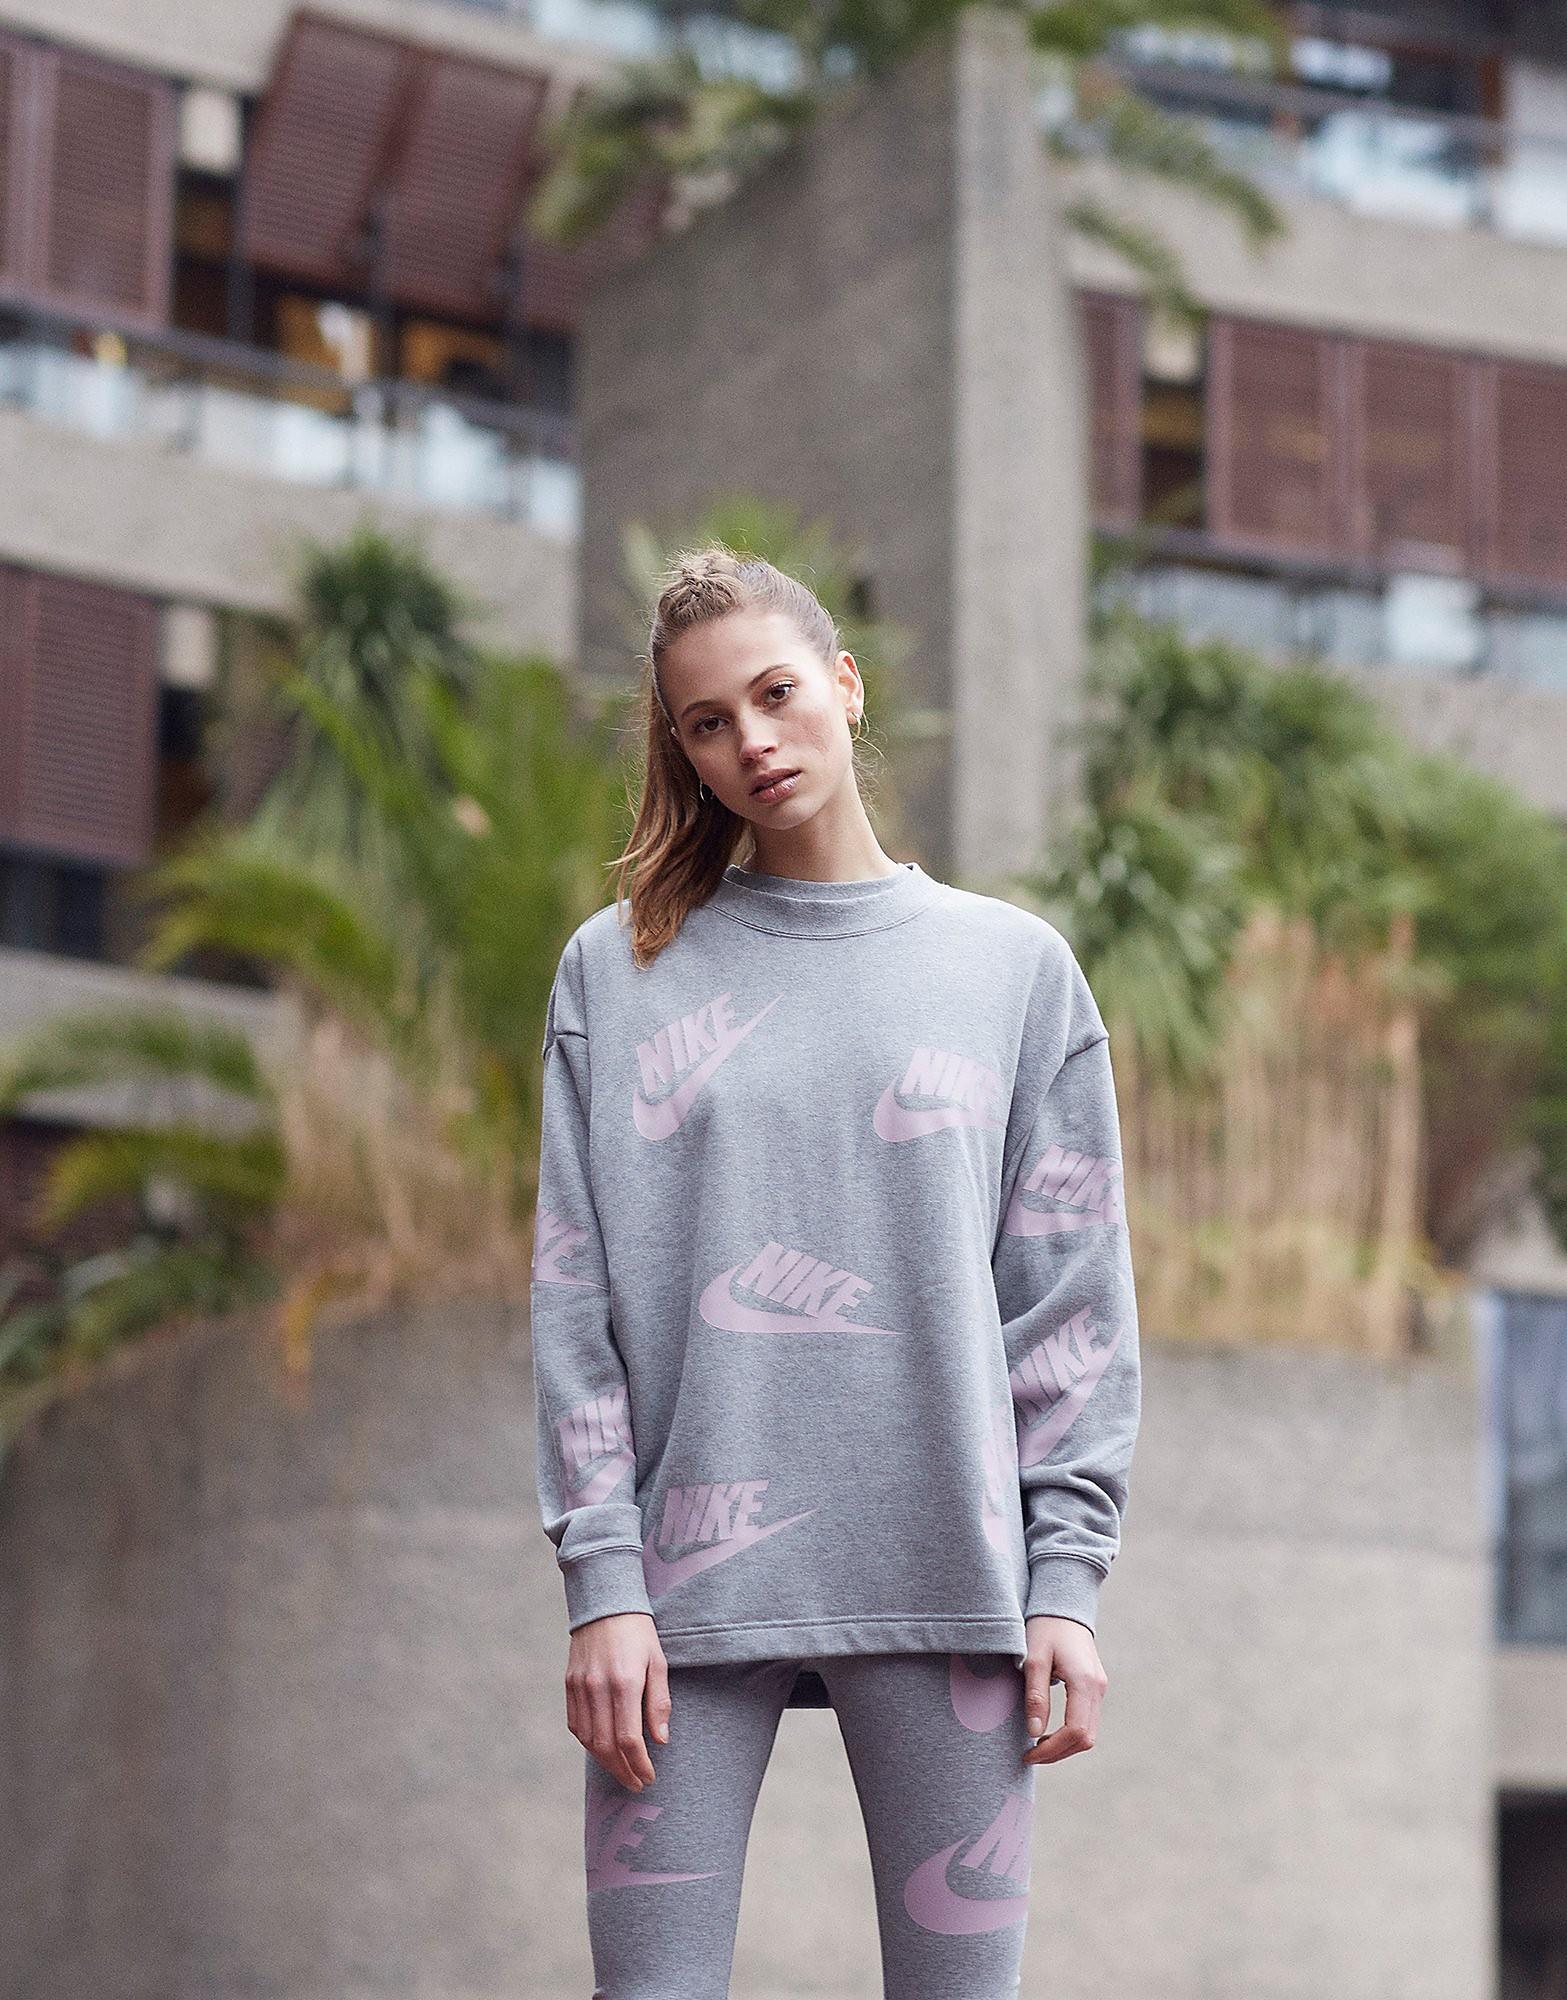 Nike Futura All Over Print Crew Sweatshirt